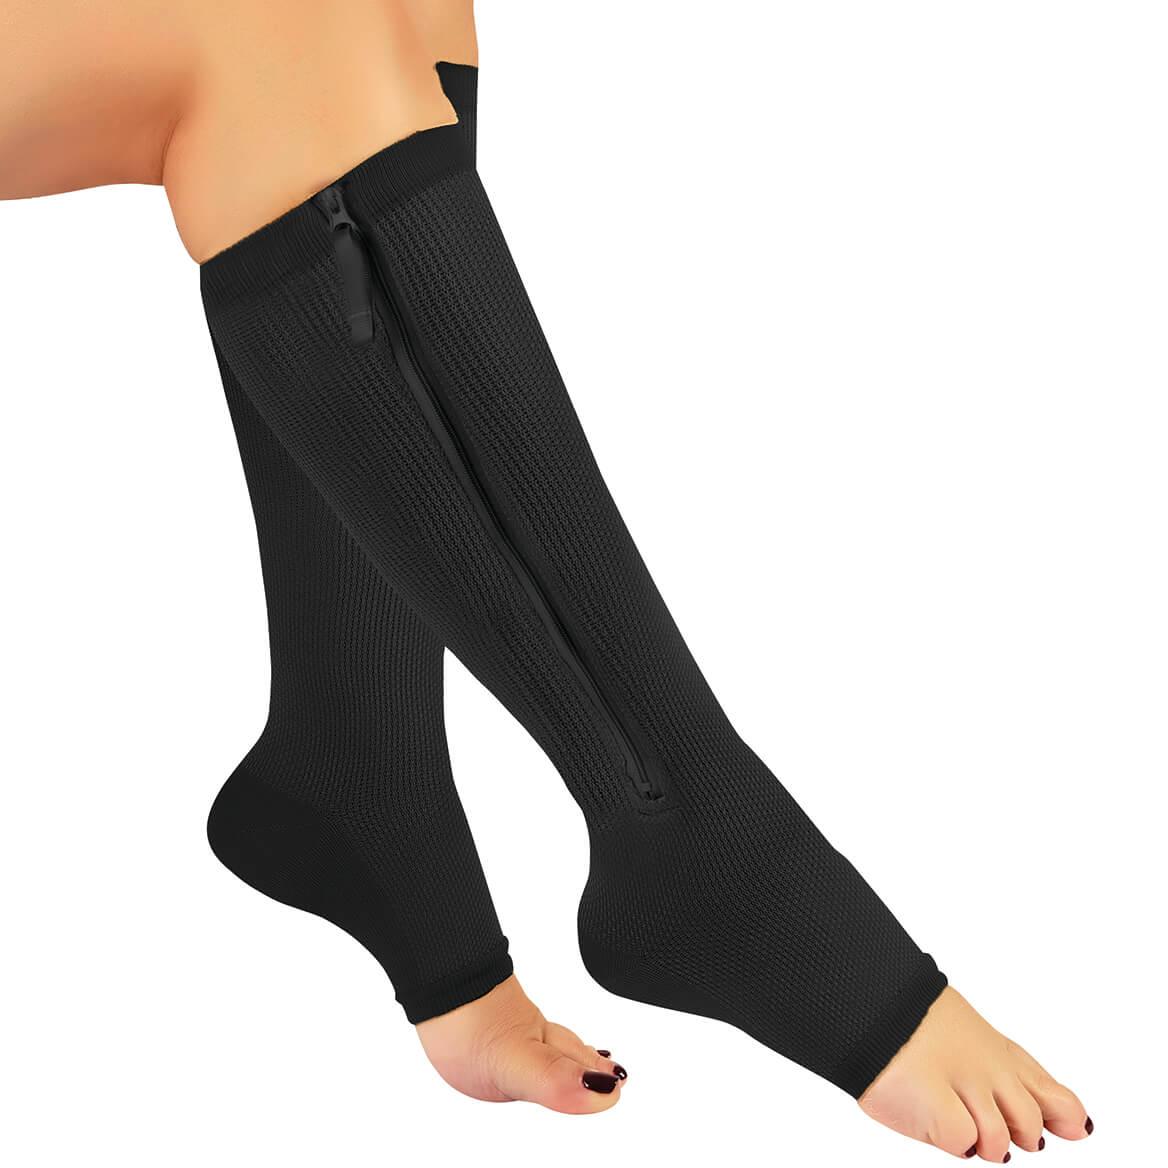 Zip-Zap HempTastic™ Open Toe Compression Socks, 20-30mmHg-369548